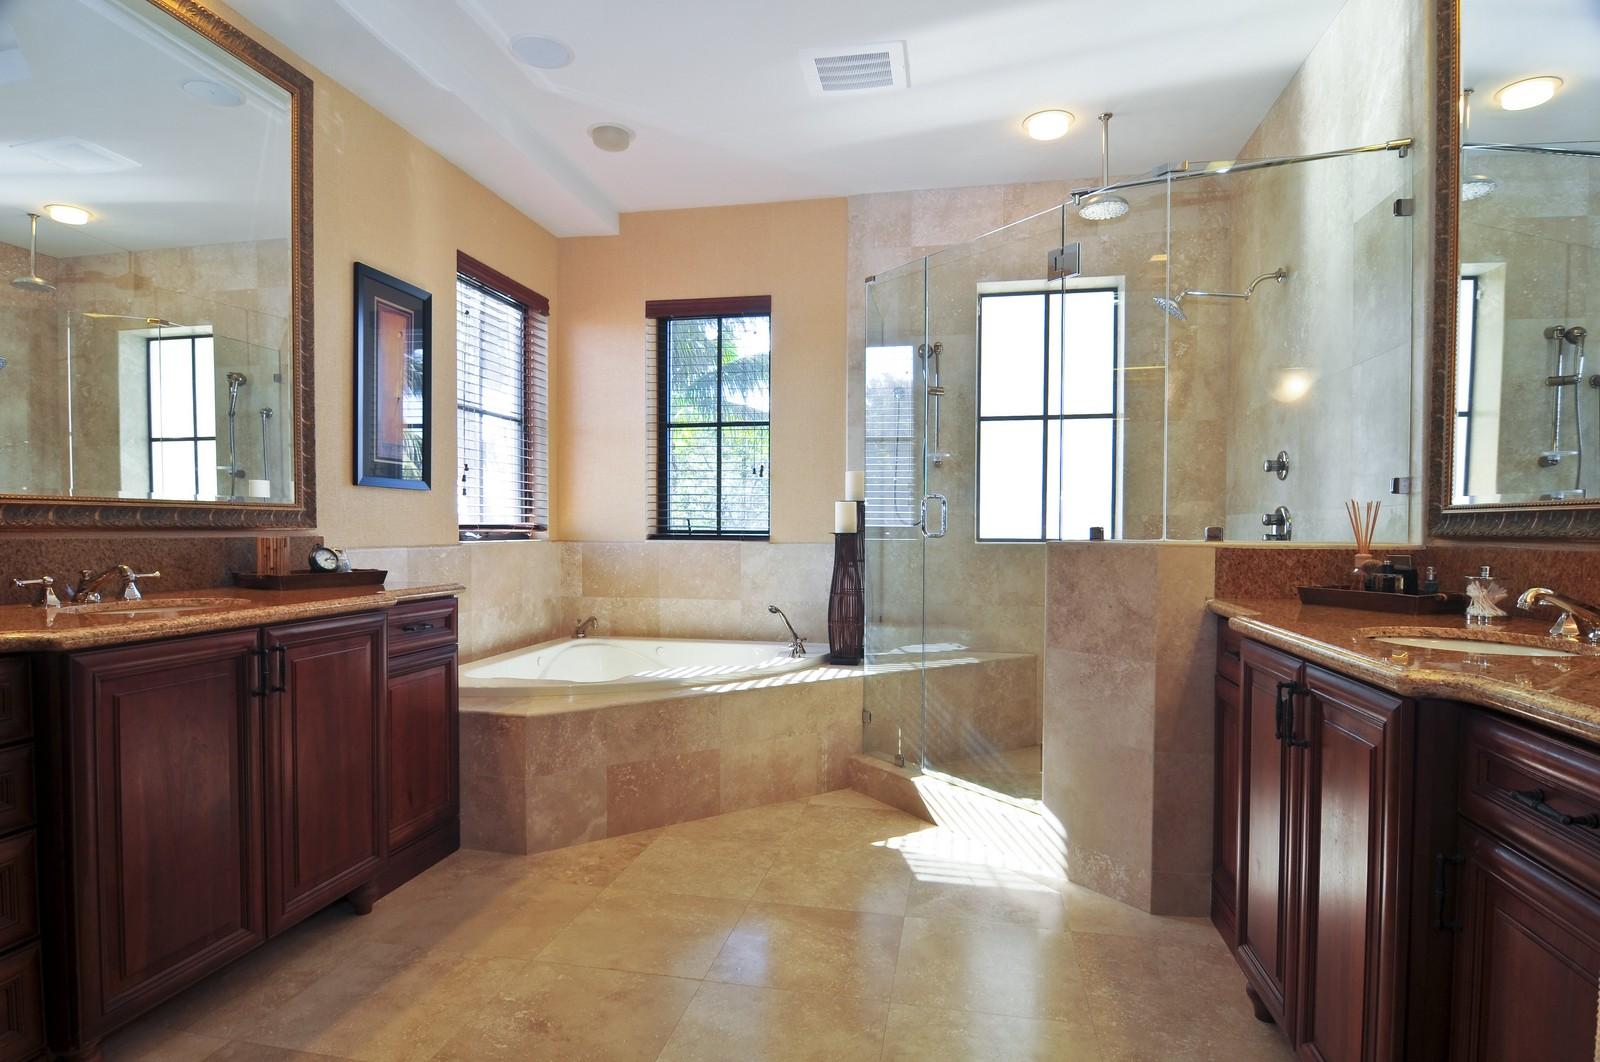 Real Estate Photography - 3040 Prairie Ave, Miami Beach, FL, 33140 - Master Bathroom